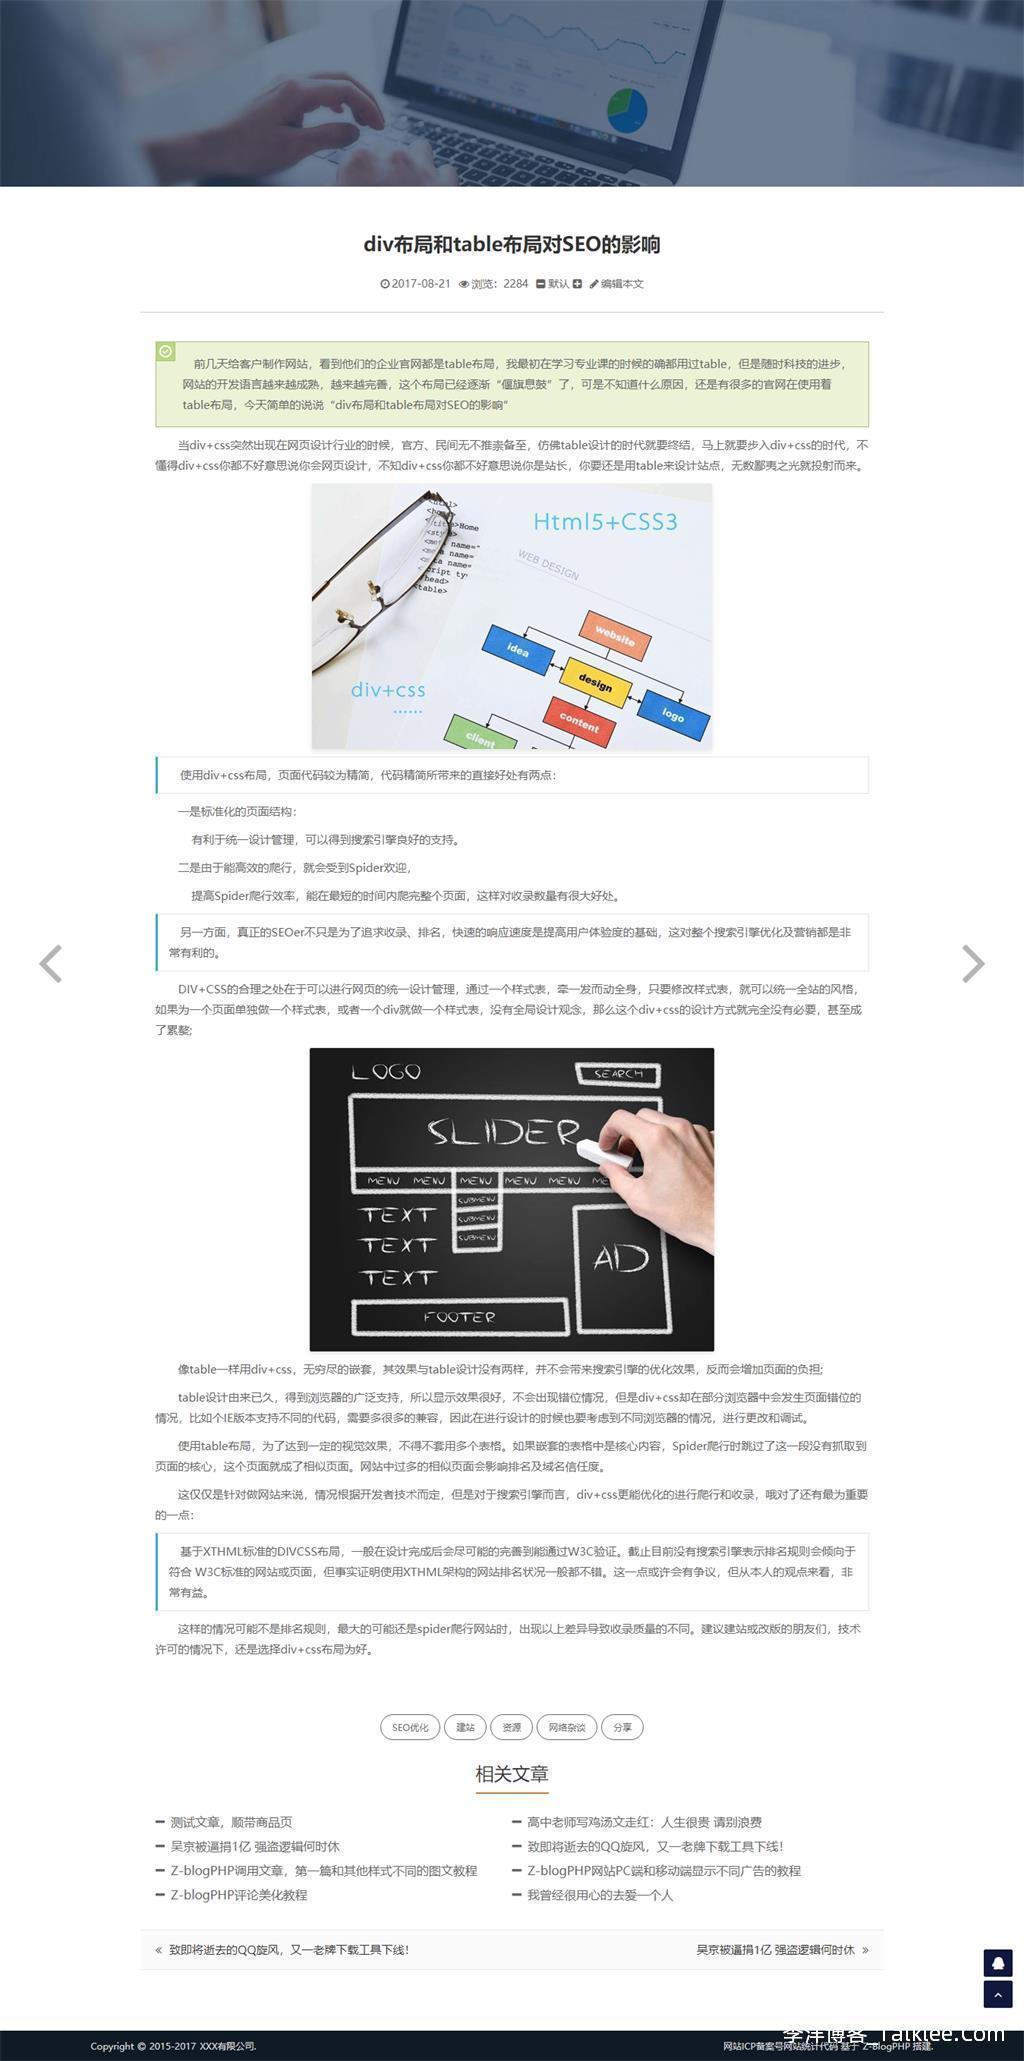 div布局和table布局对SEO的影响 - 互联网 - 网站SEO标题.jpg